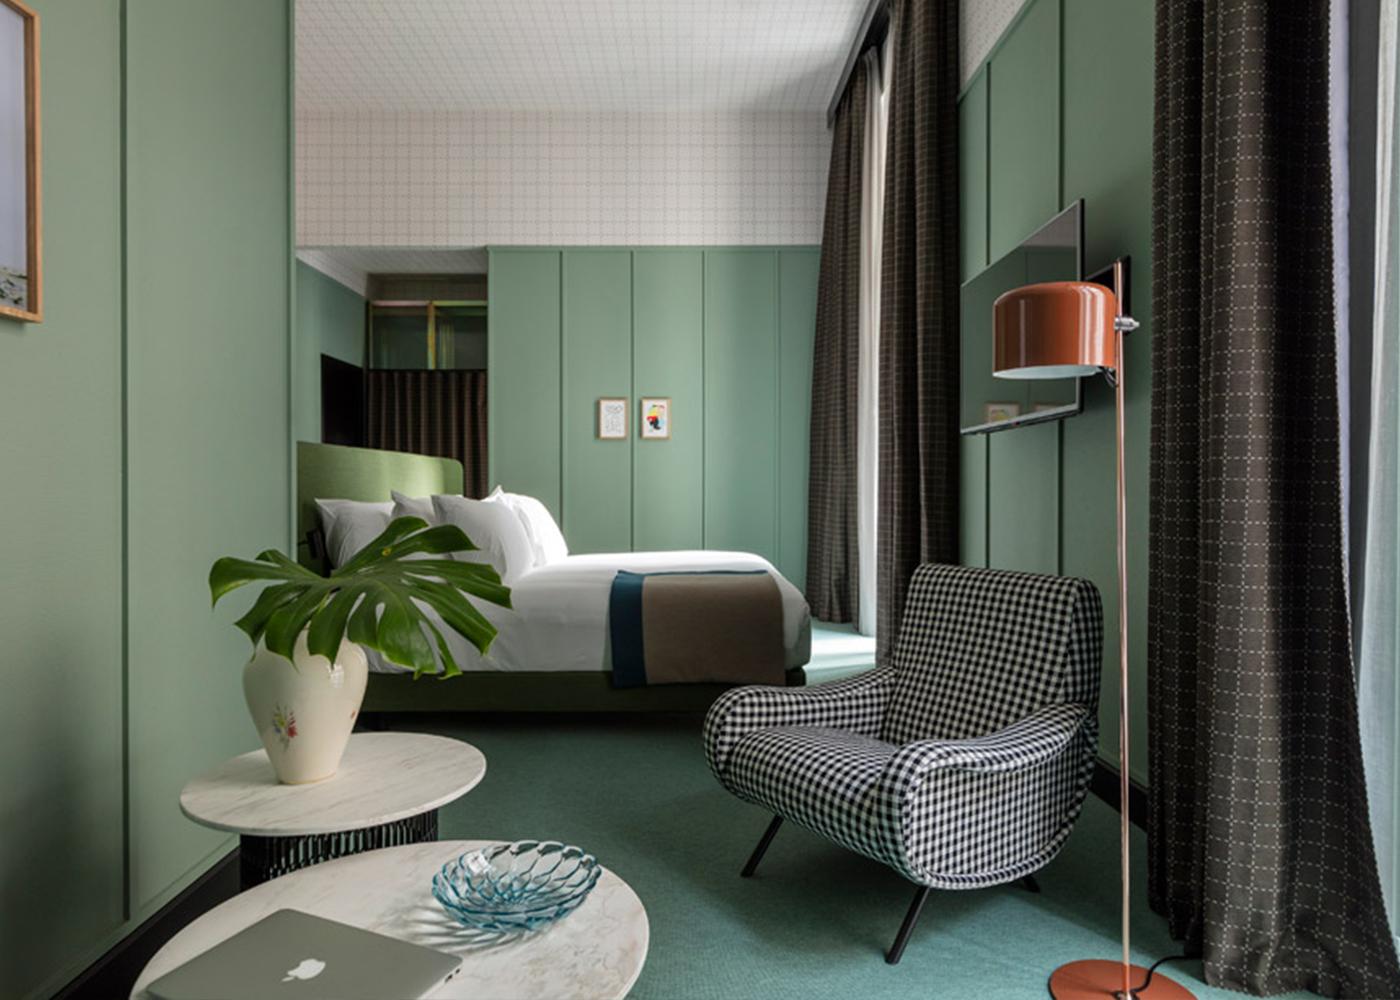 patricia-urquiola-room-mate-hotels-interior-design-milan_dezeen_936_7